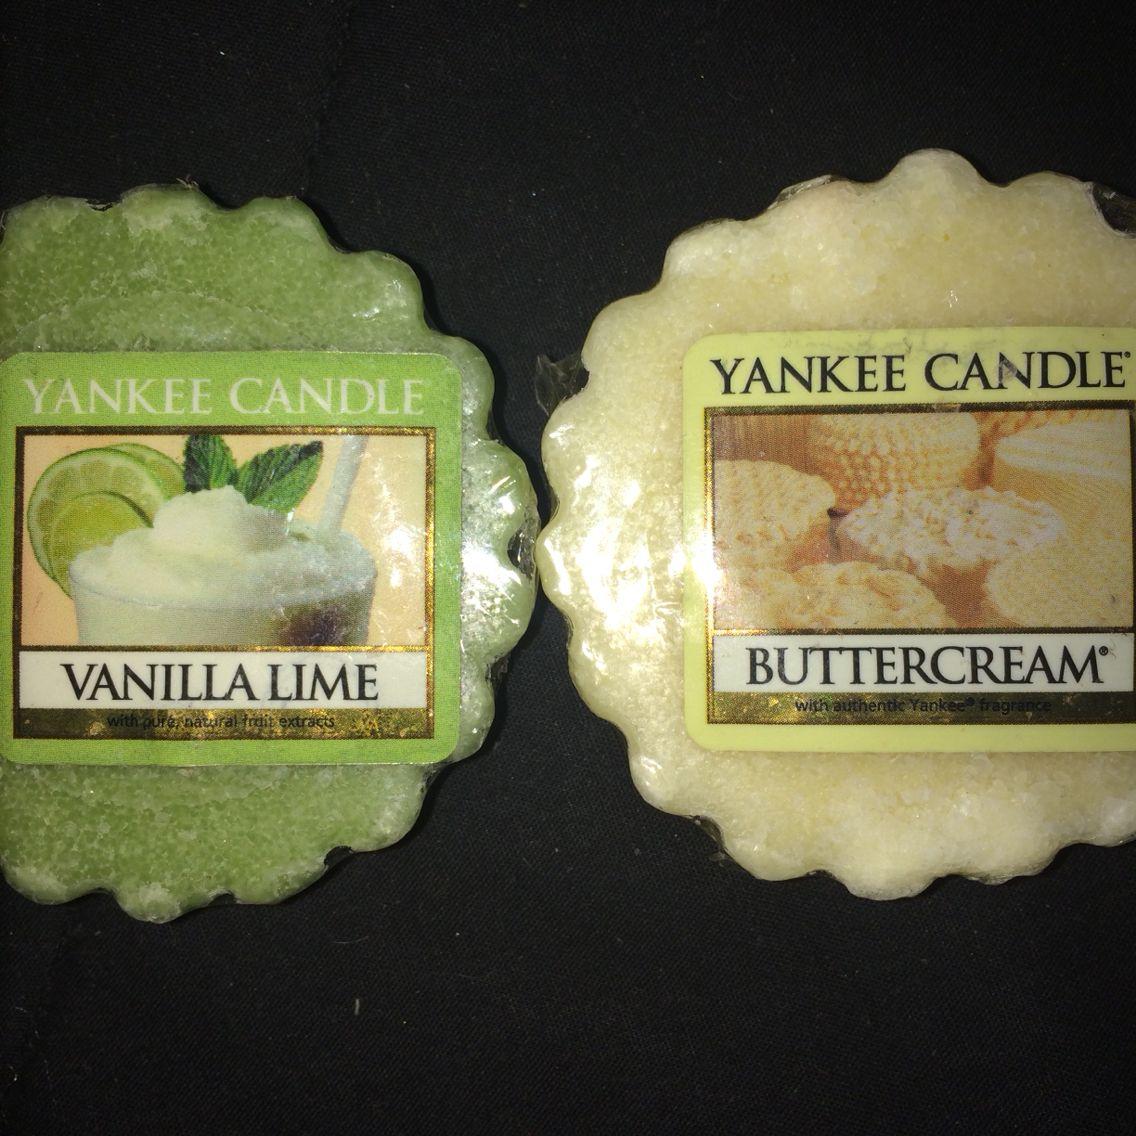 Key Lime PieYankee Candle Mixology Yankee candle